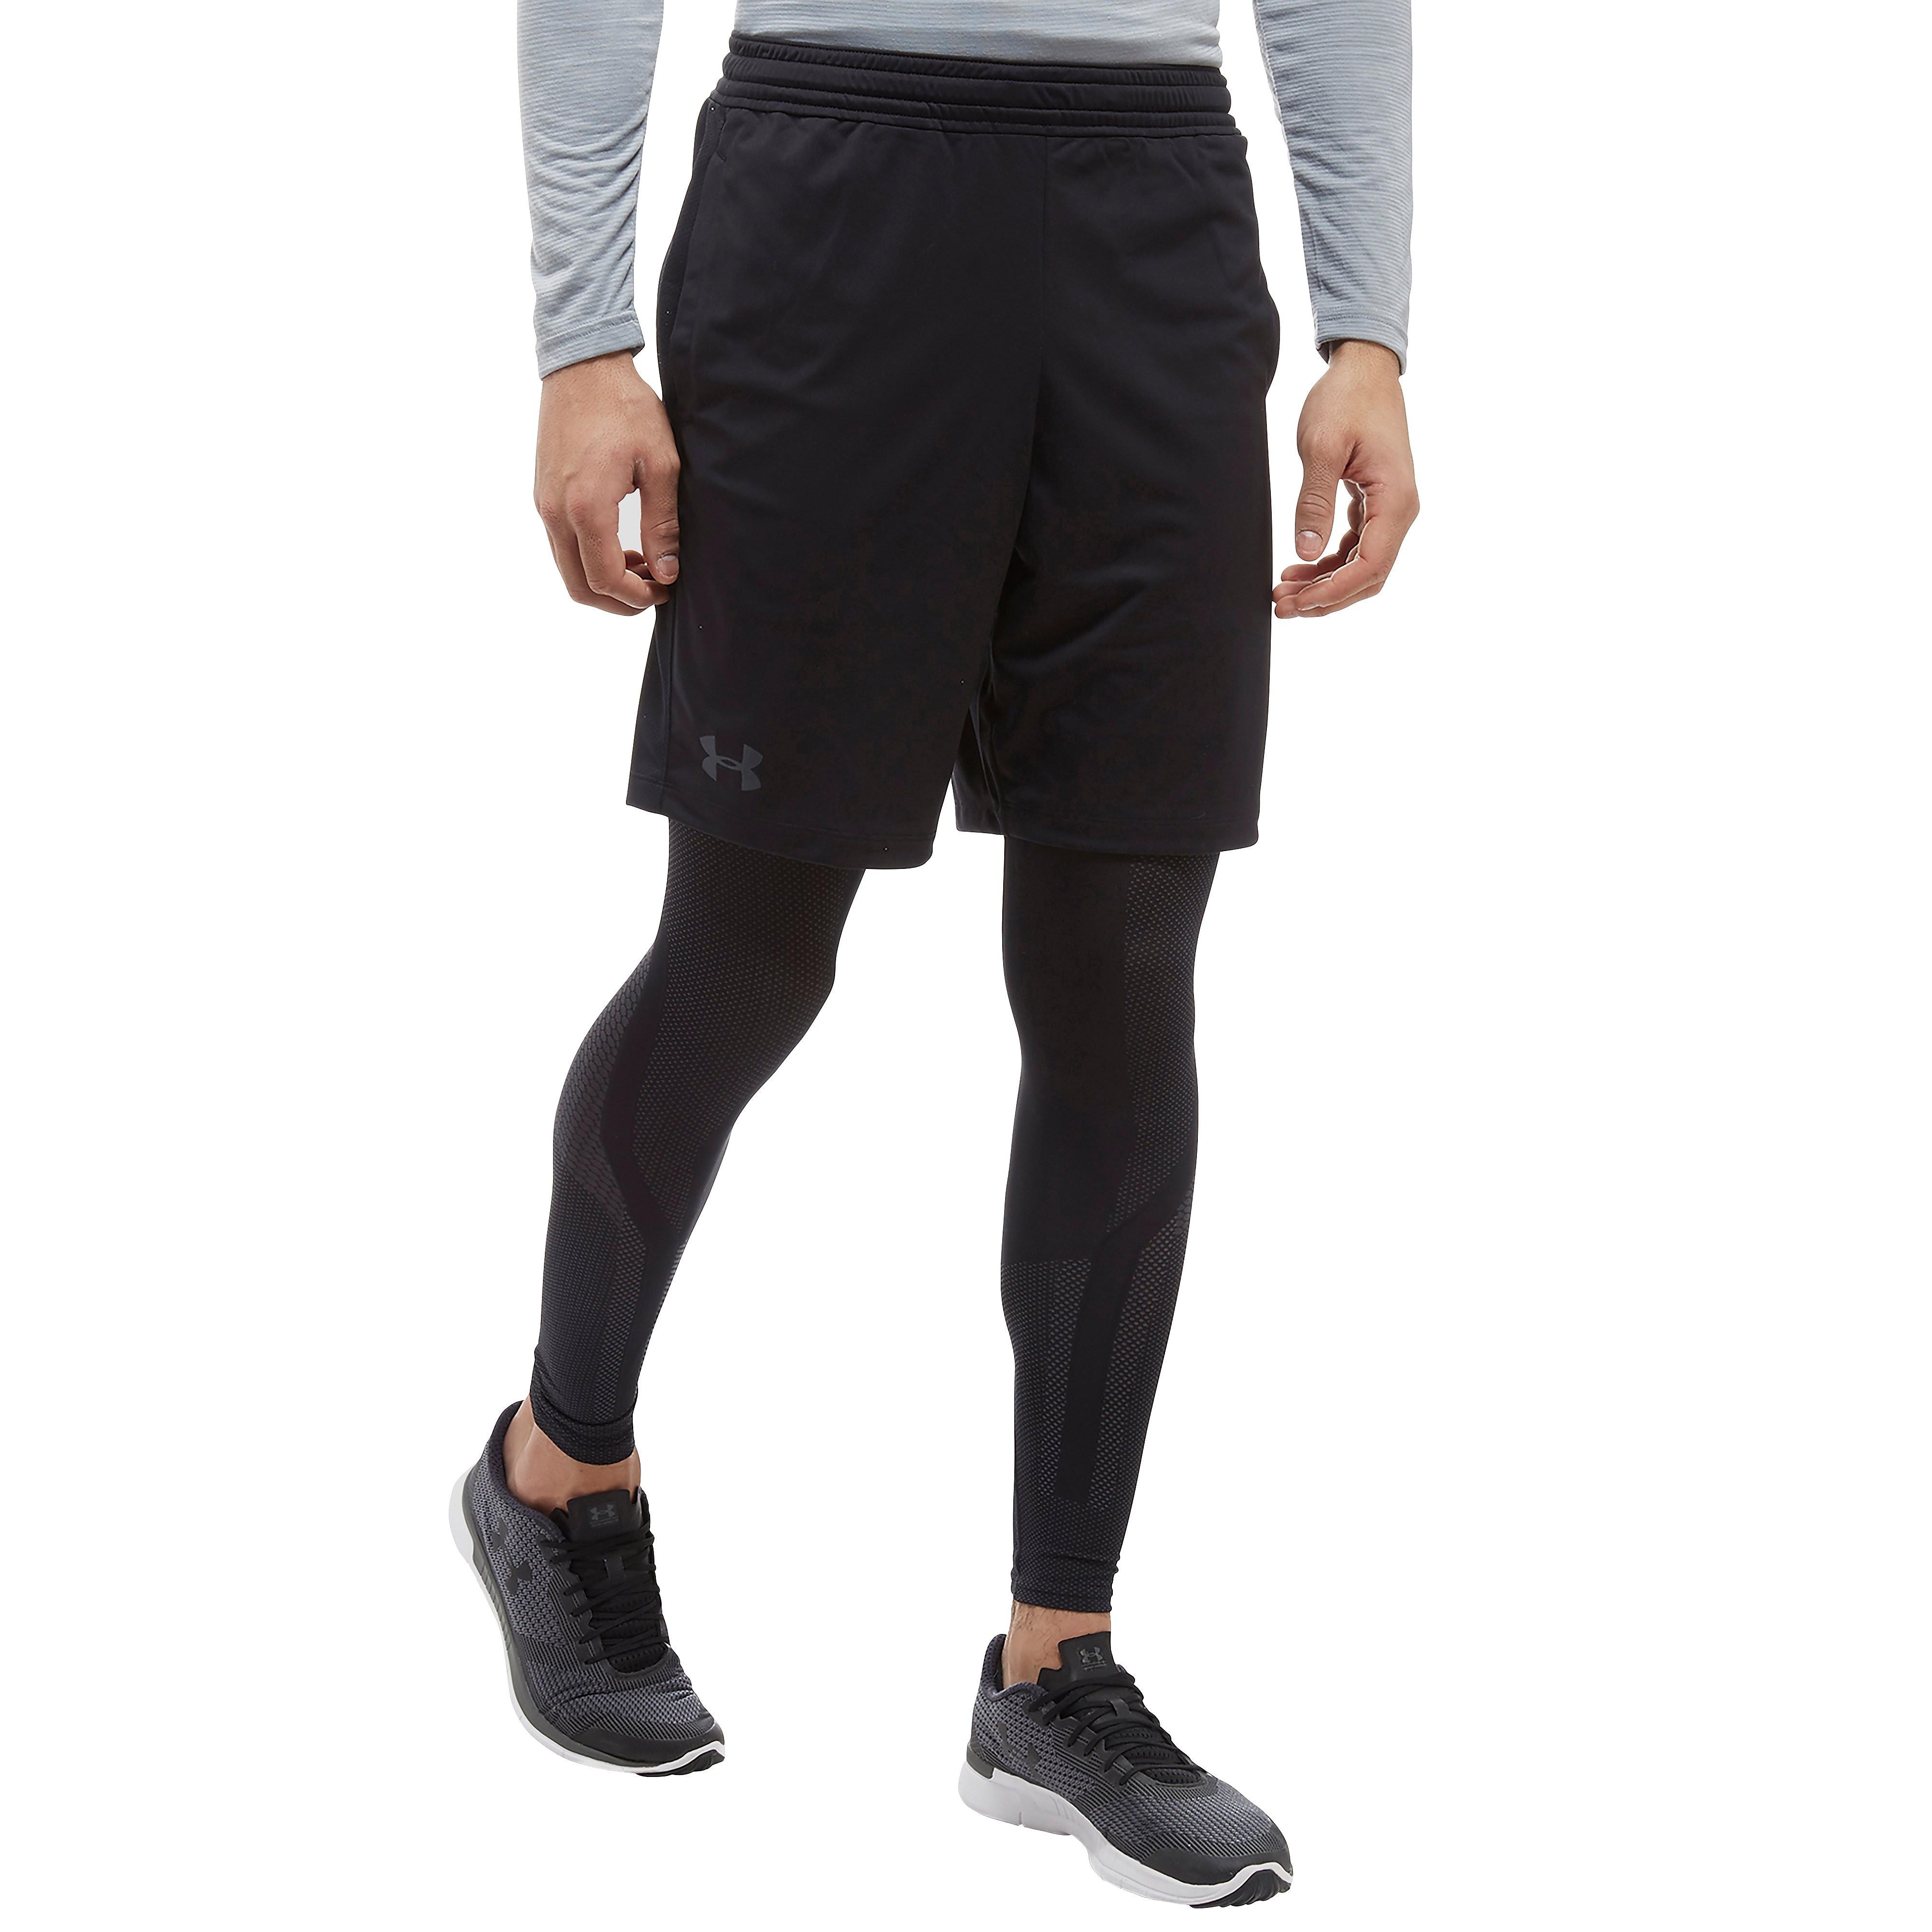 Under Armour Raid 2.0 8 Inch Men's Shorts